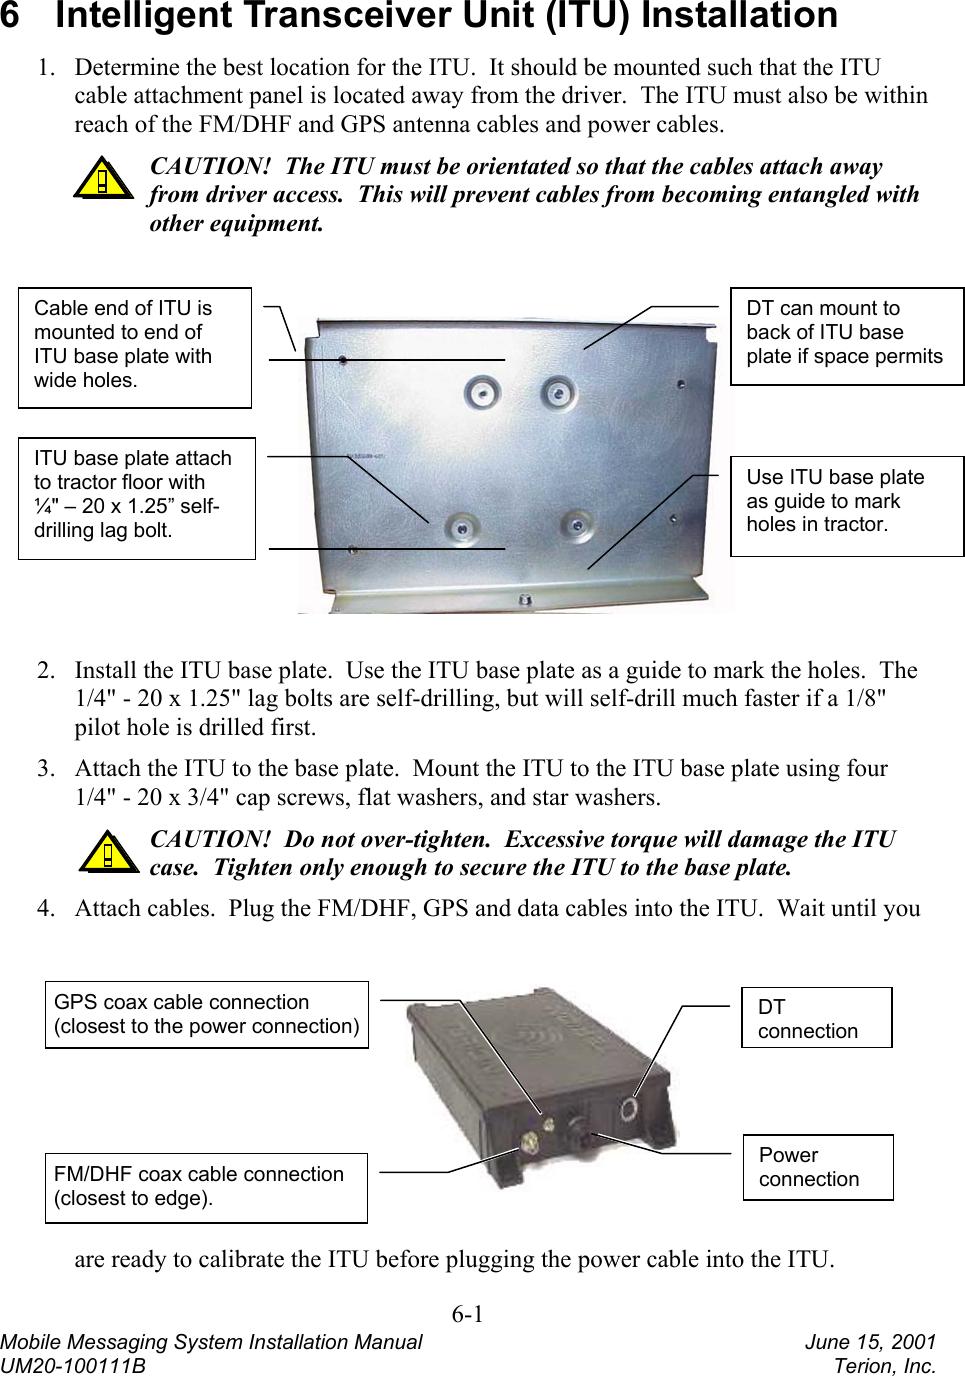 Terion 5234DHFM Mobile Messenger DHF-2000 User Manual Mobile